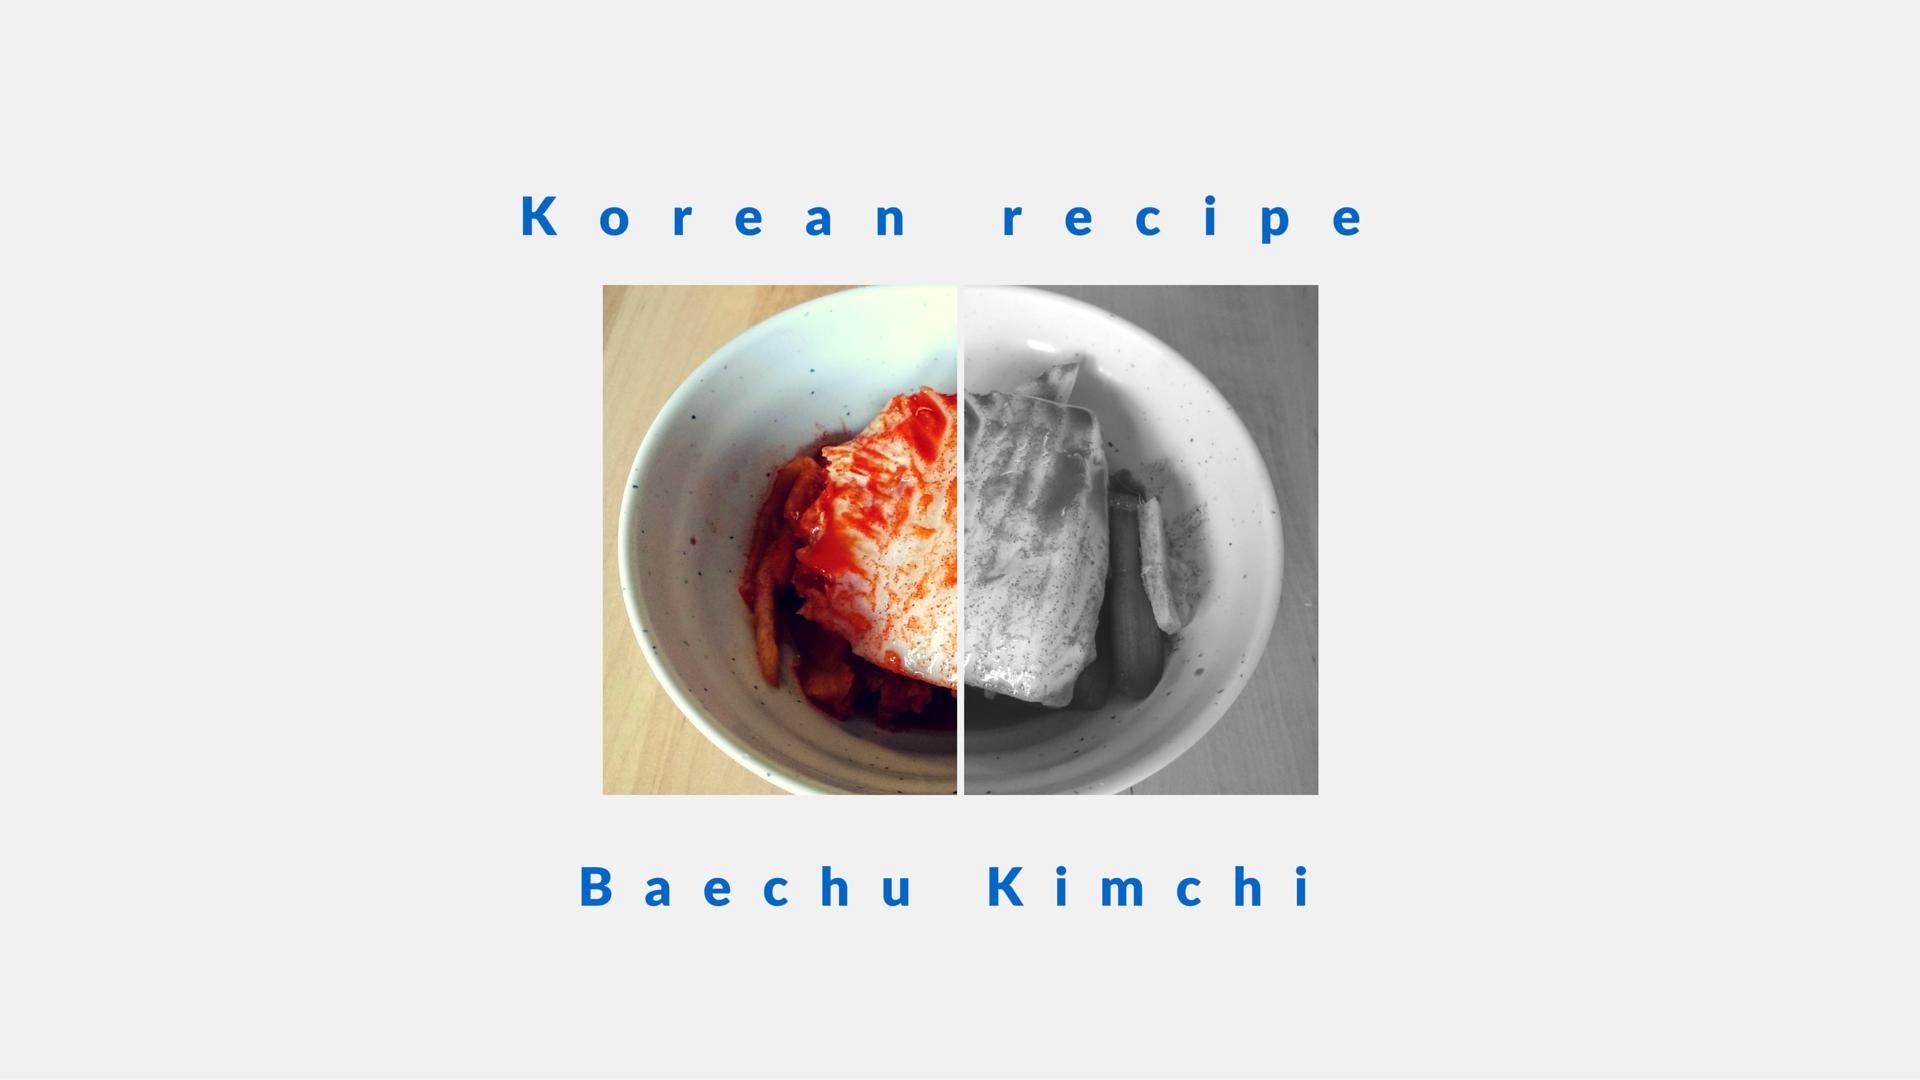 Hanhan Jabji's Baechu Kimchi